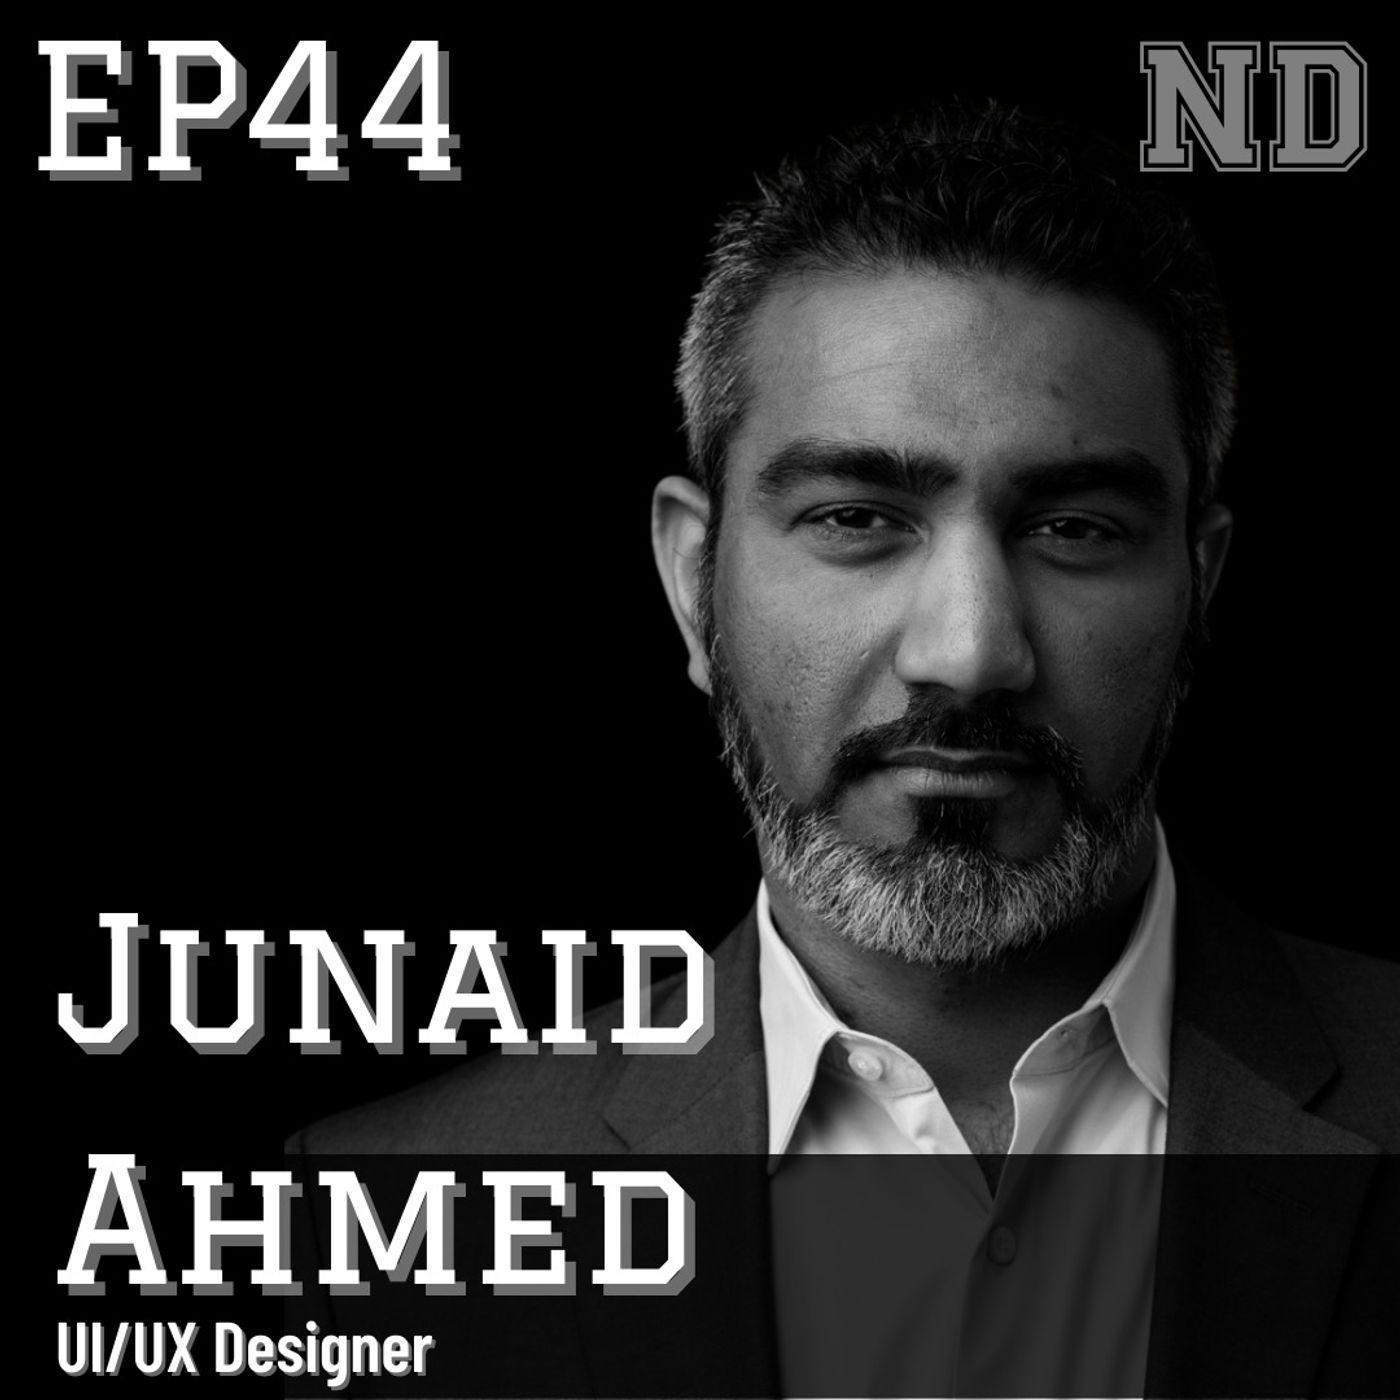 Junaid Ahmed, UI/UX Designer